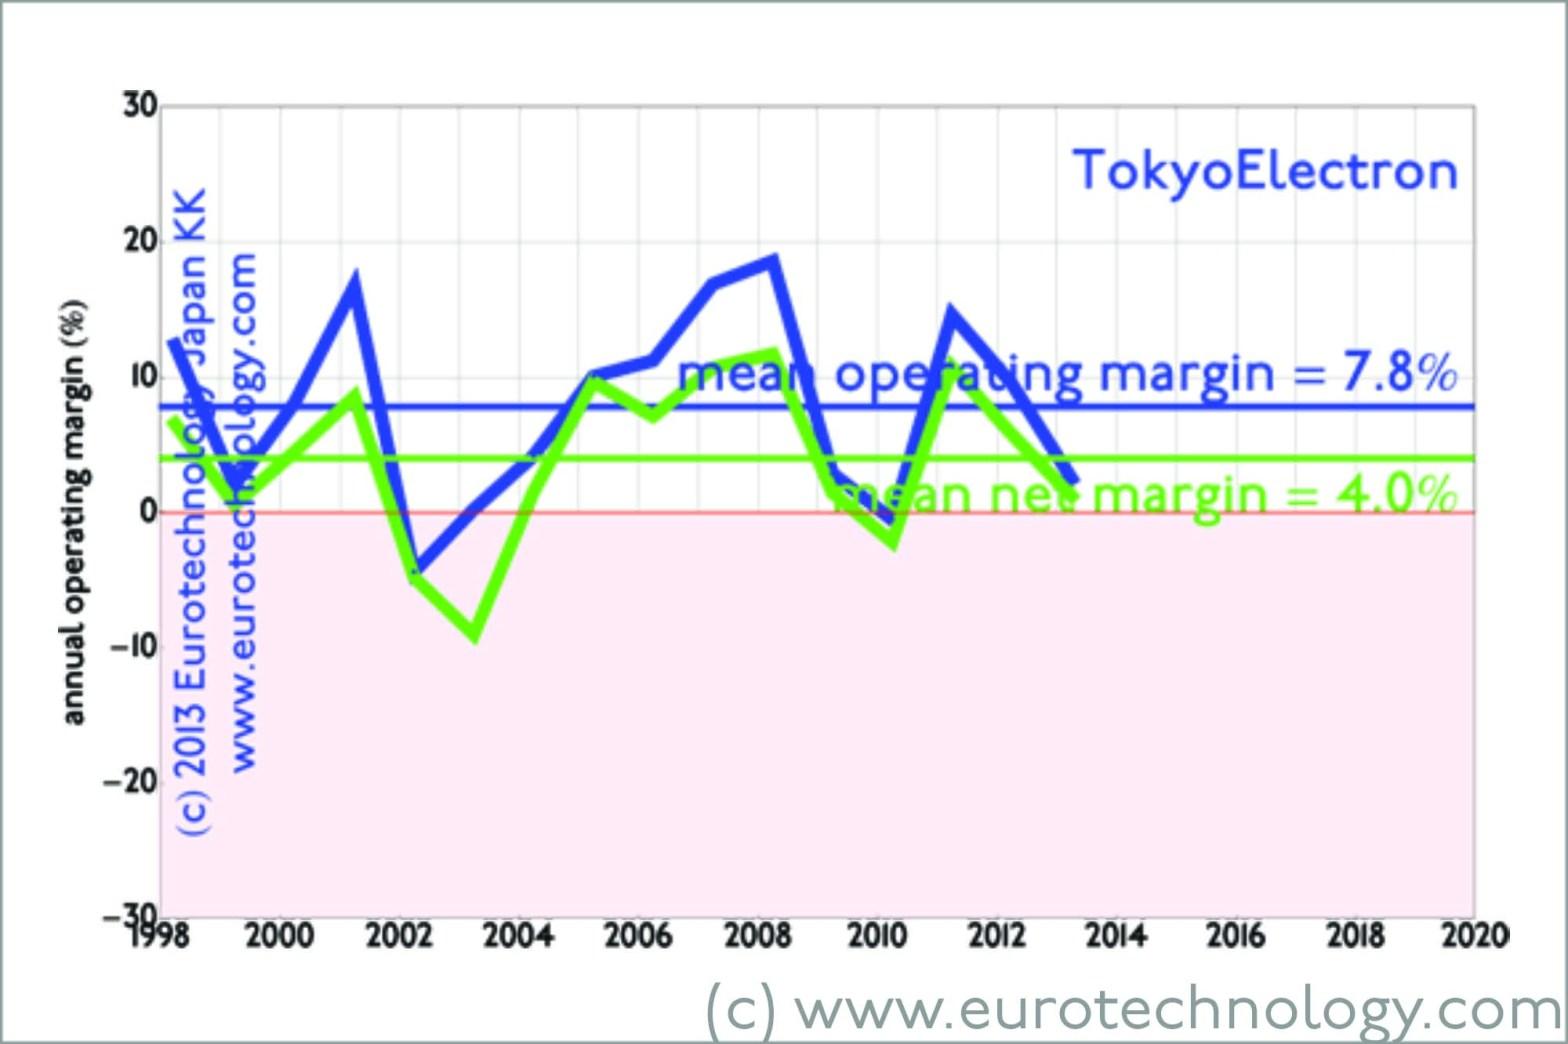 Tokyo Electron TEL margins